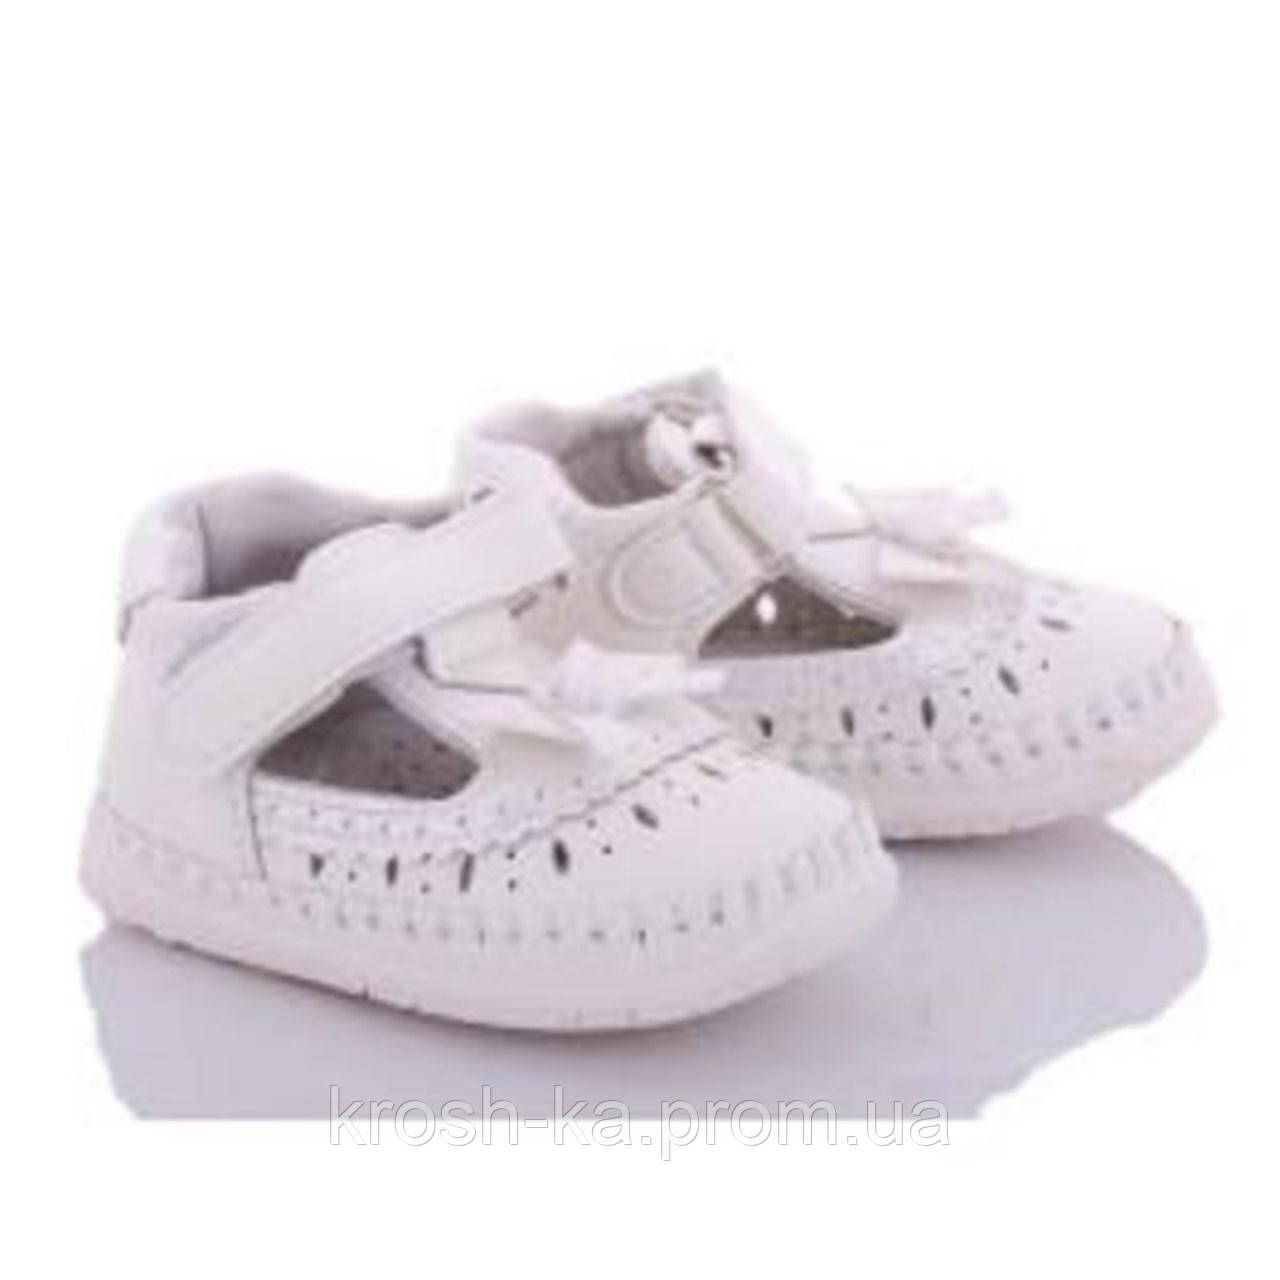 Туфли-пинетки  для девочки белый перламутр(17-20)р Clibee Китай FC19-15